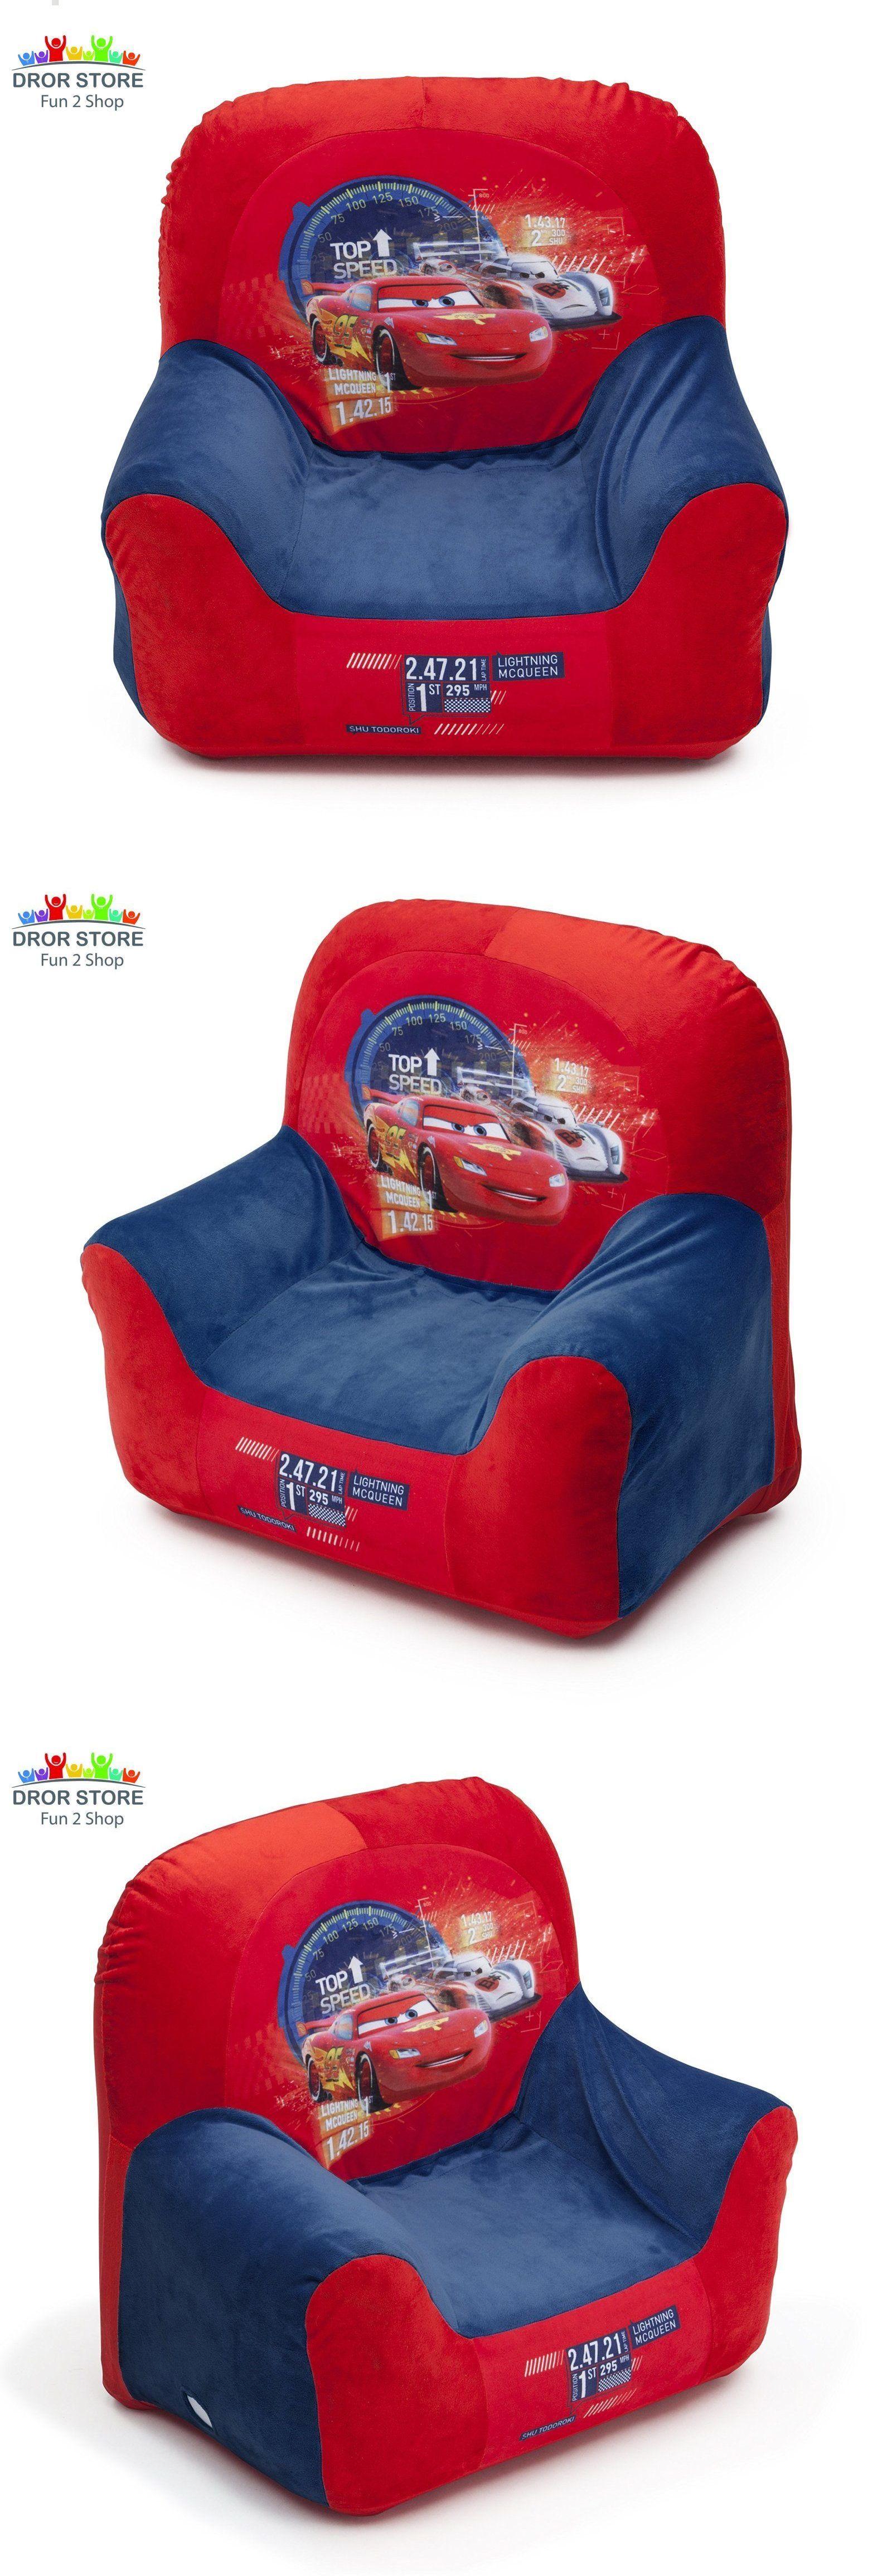 Kids Furniture Disney Car Club Chair For Kids Toddler Furniture